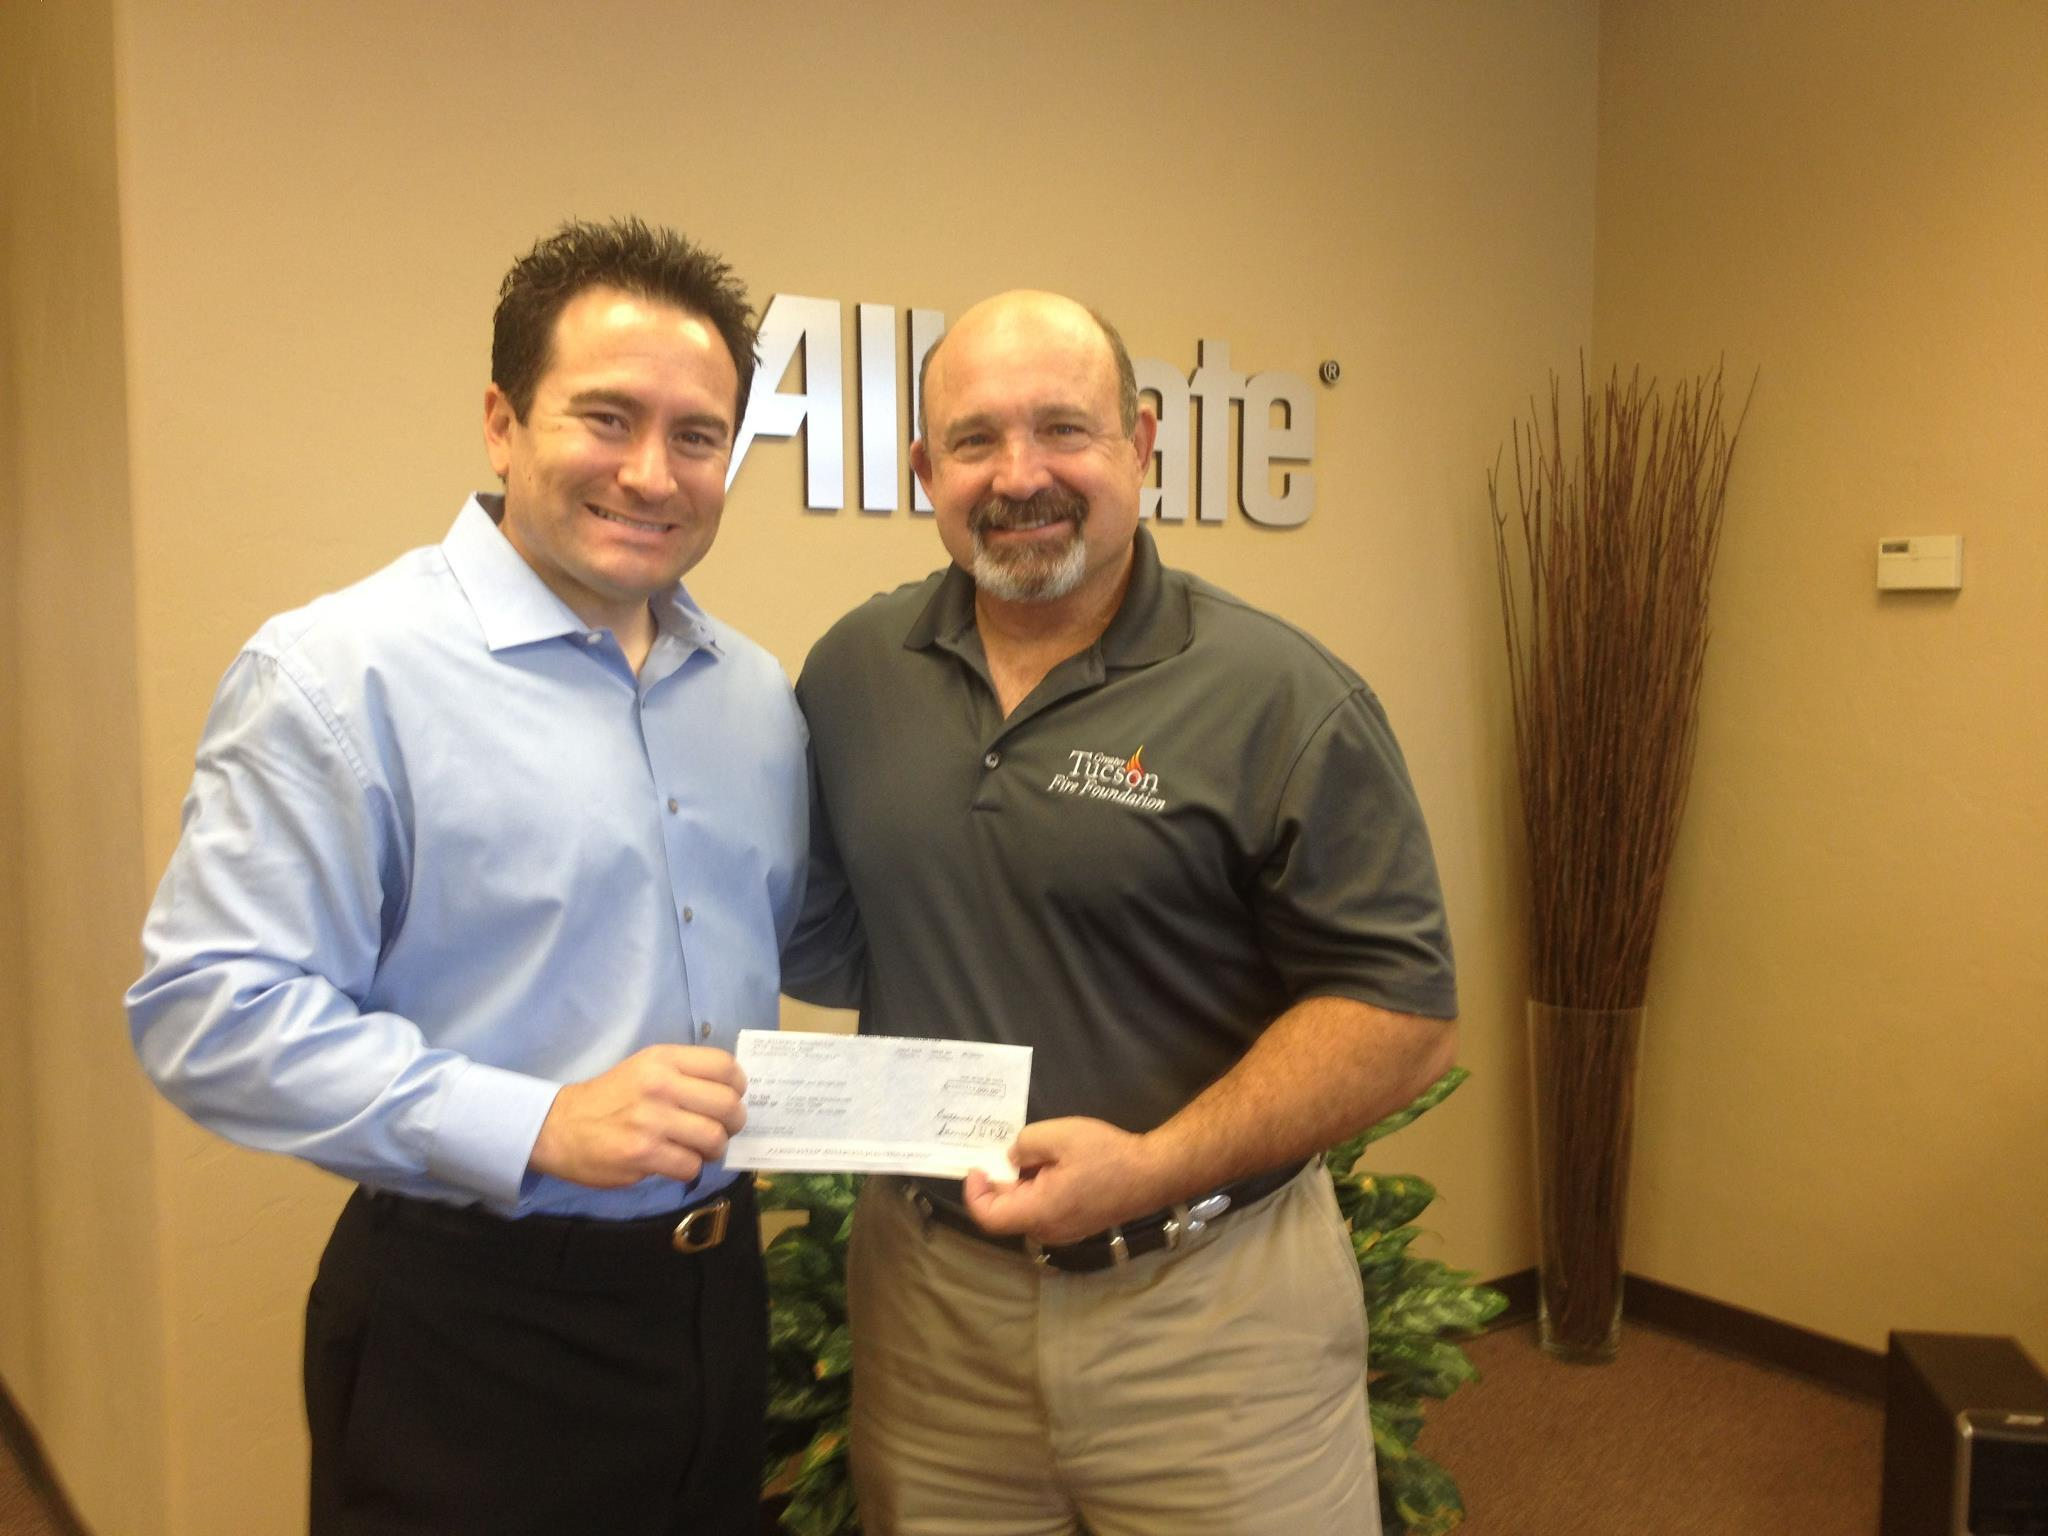 Edmund Marquez: Allstate Insurance image 4